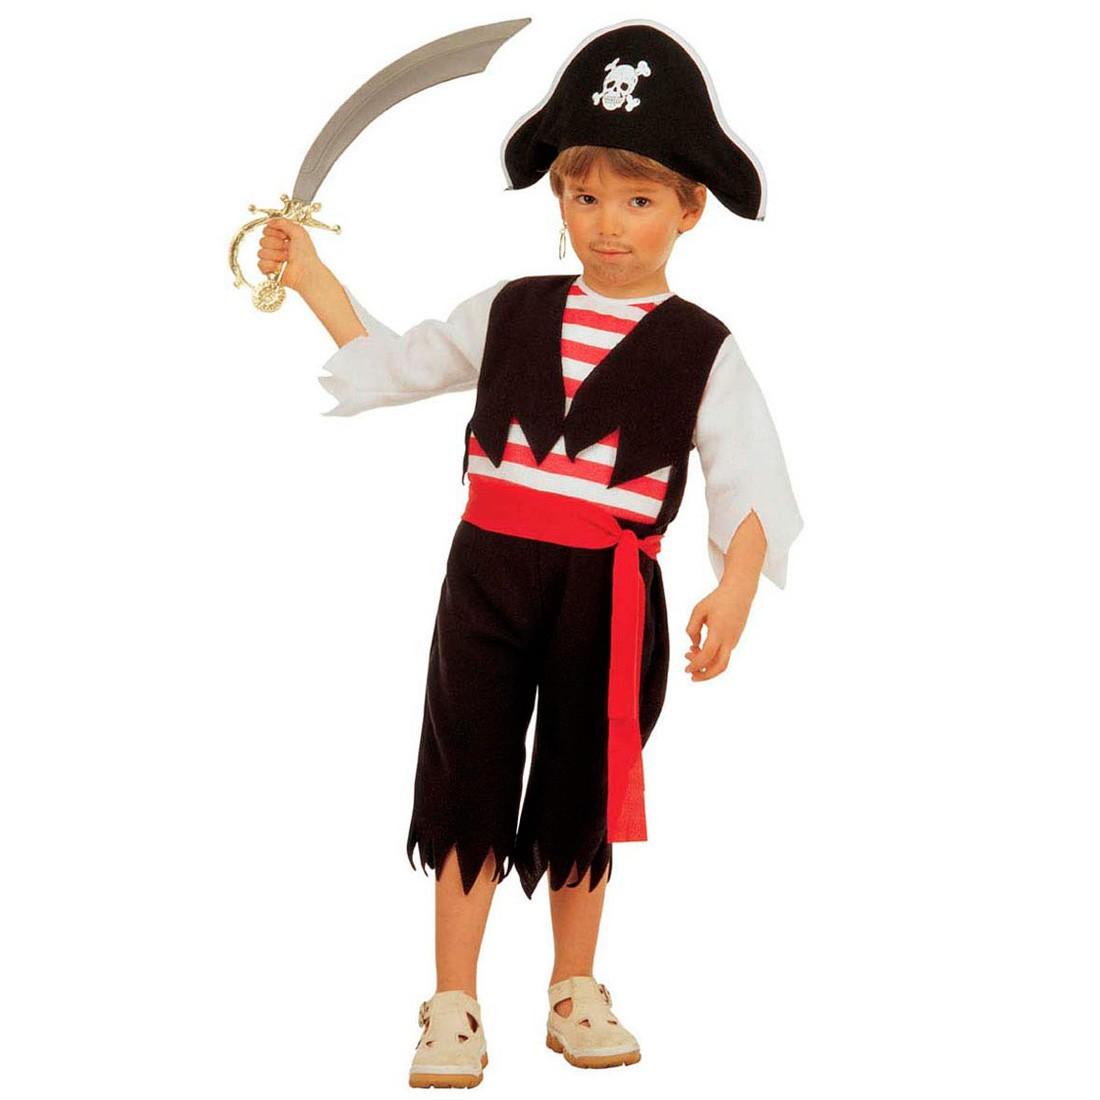 Костюм пирата своими руками на скорую руку фото